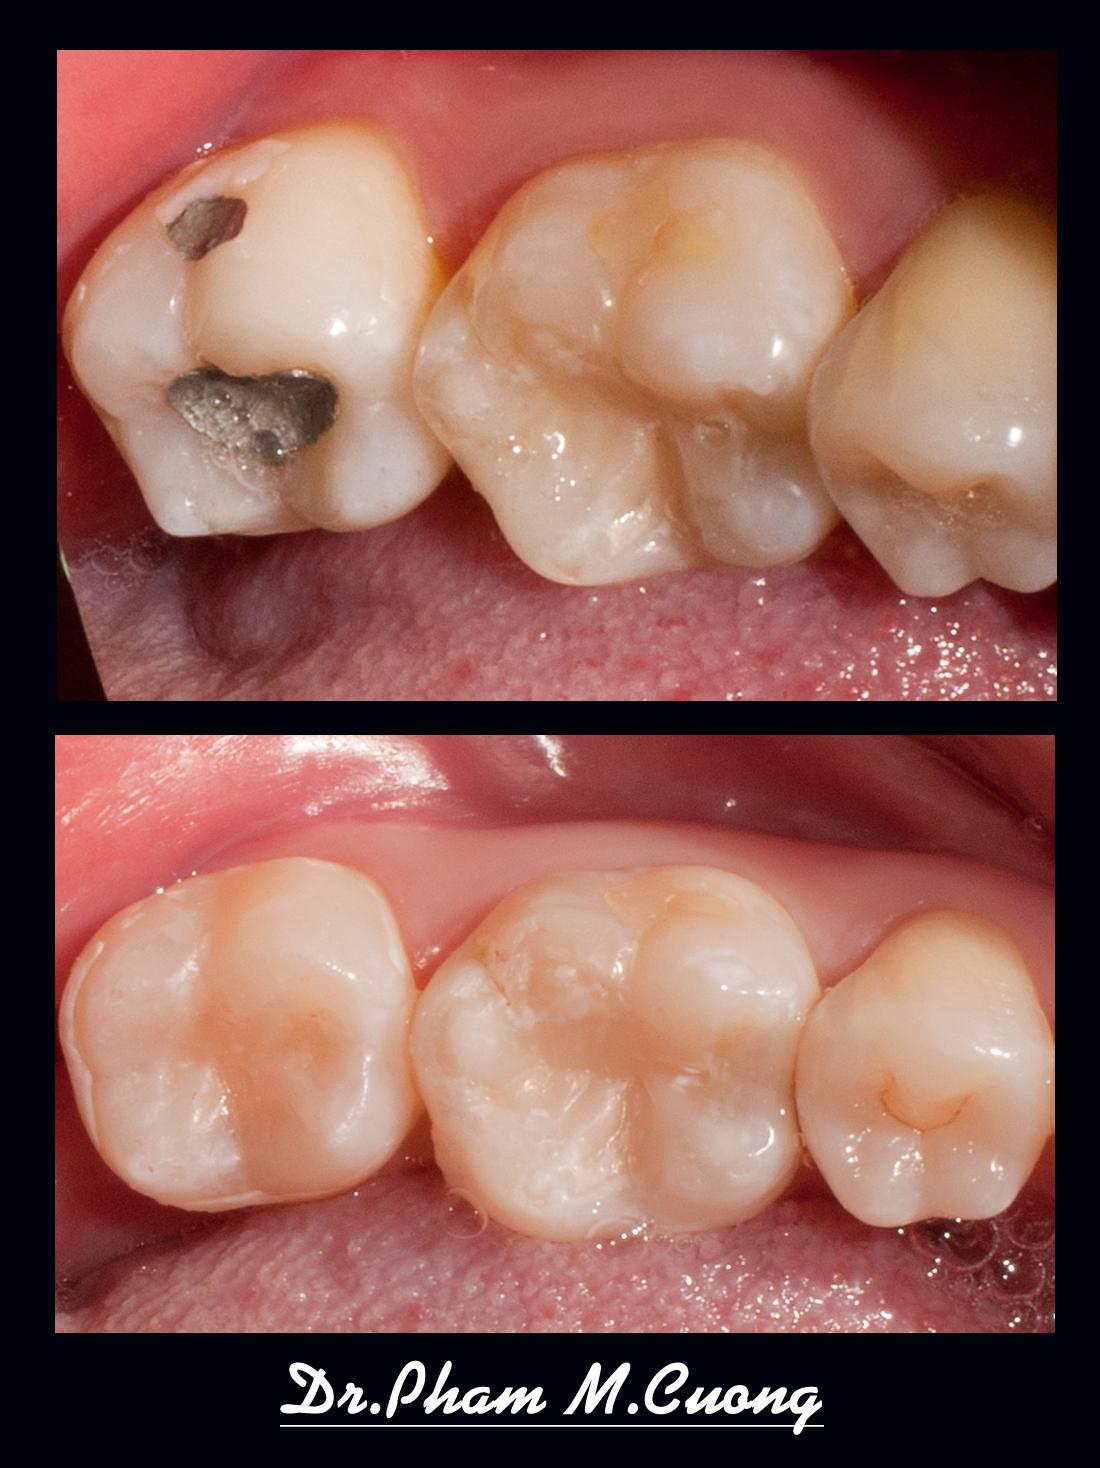 implant-rang-su-chinh-nha-nha-khoa-dental-drcuong-tram-rang-nho-rang-khong-dau-artdent-02